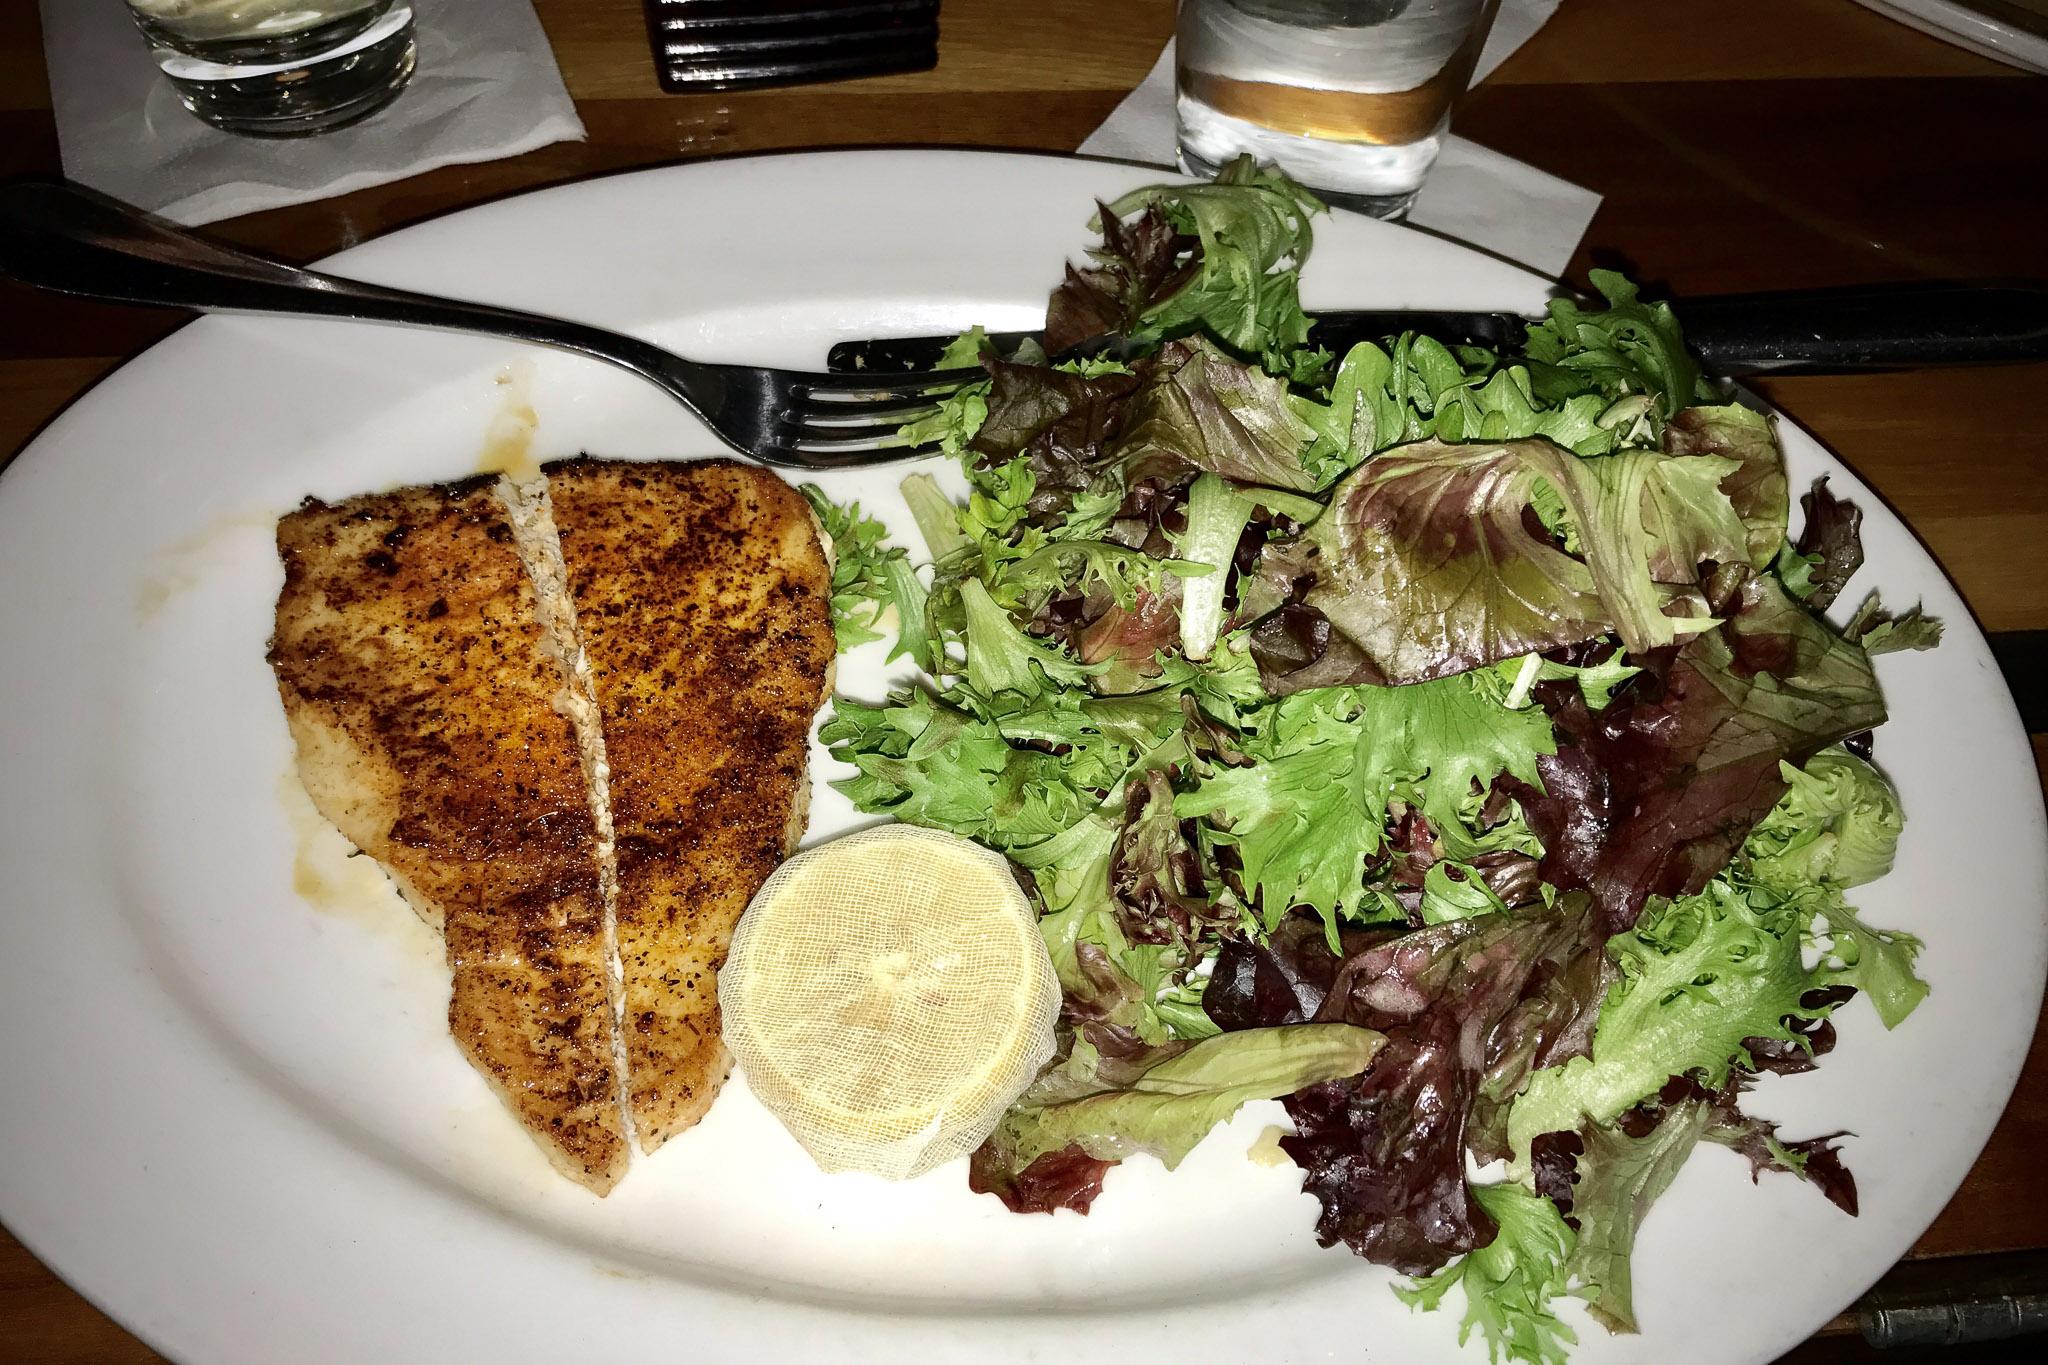 Blackened grilled swordfish